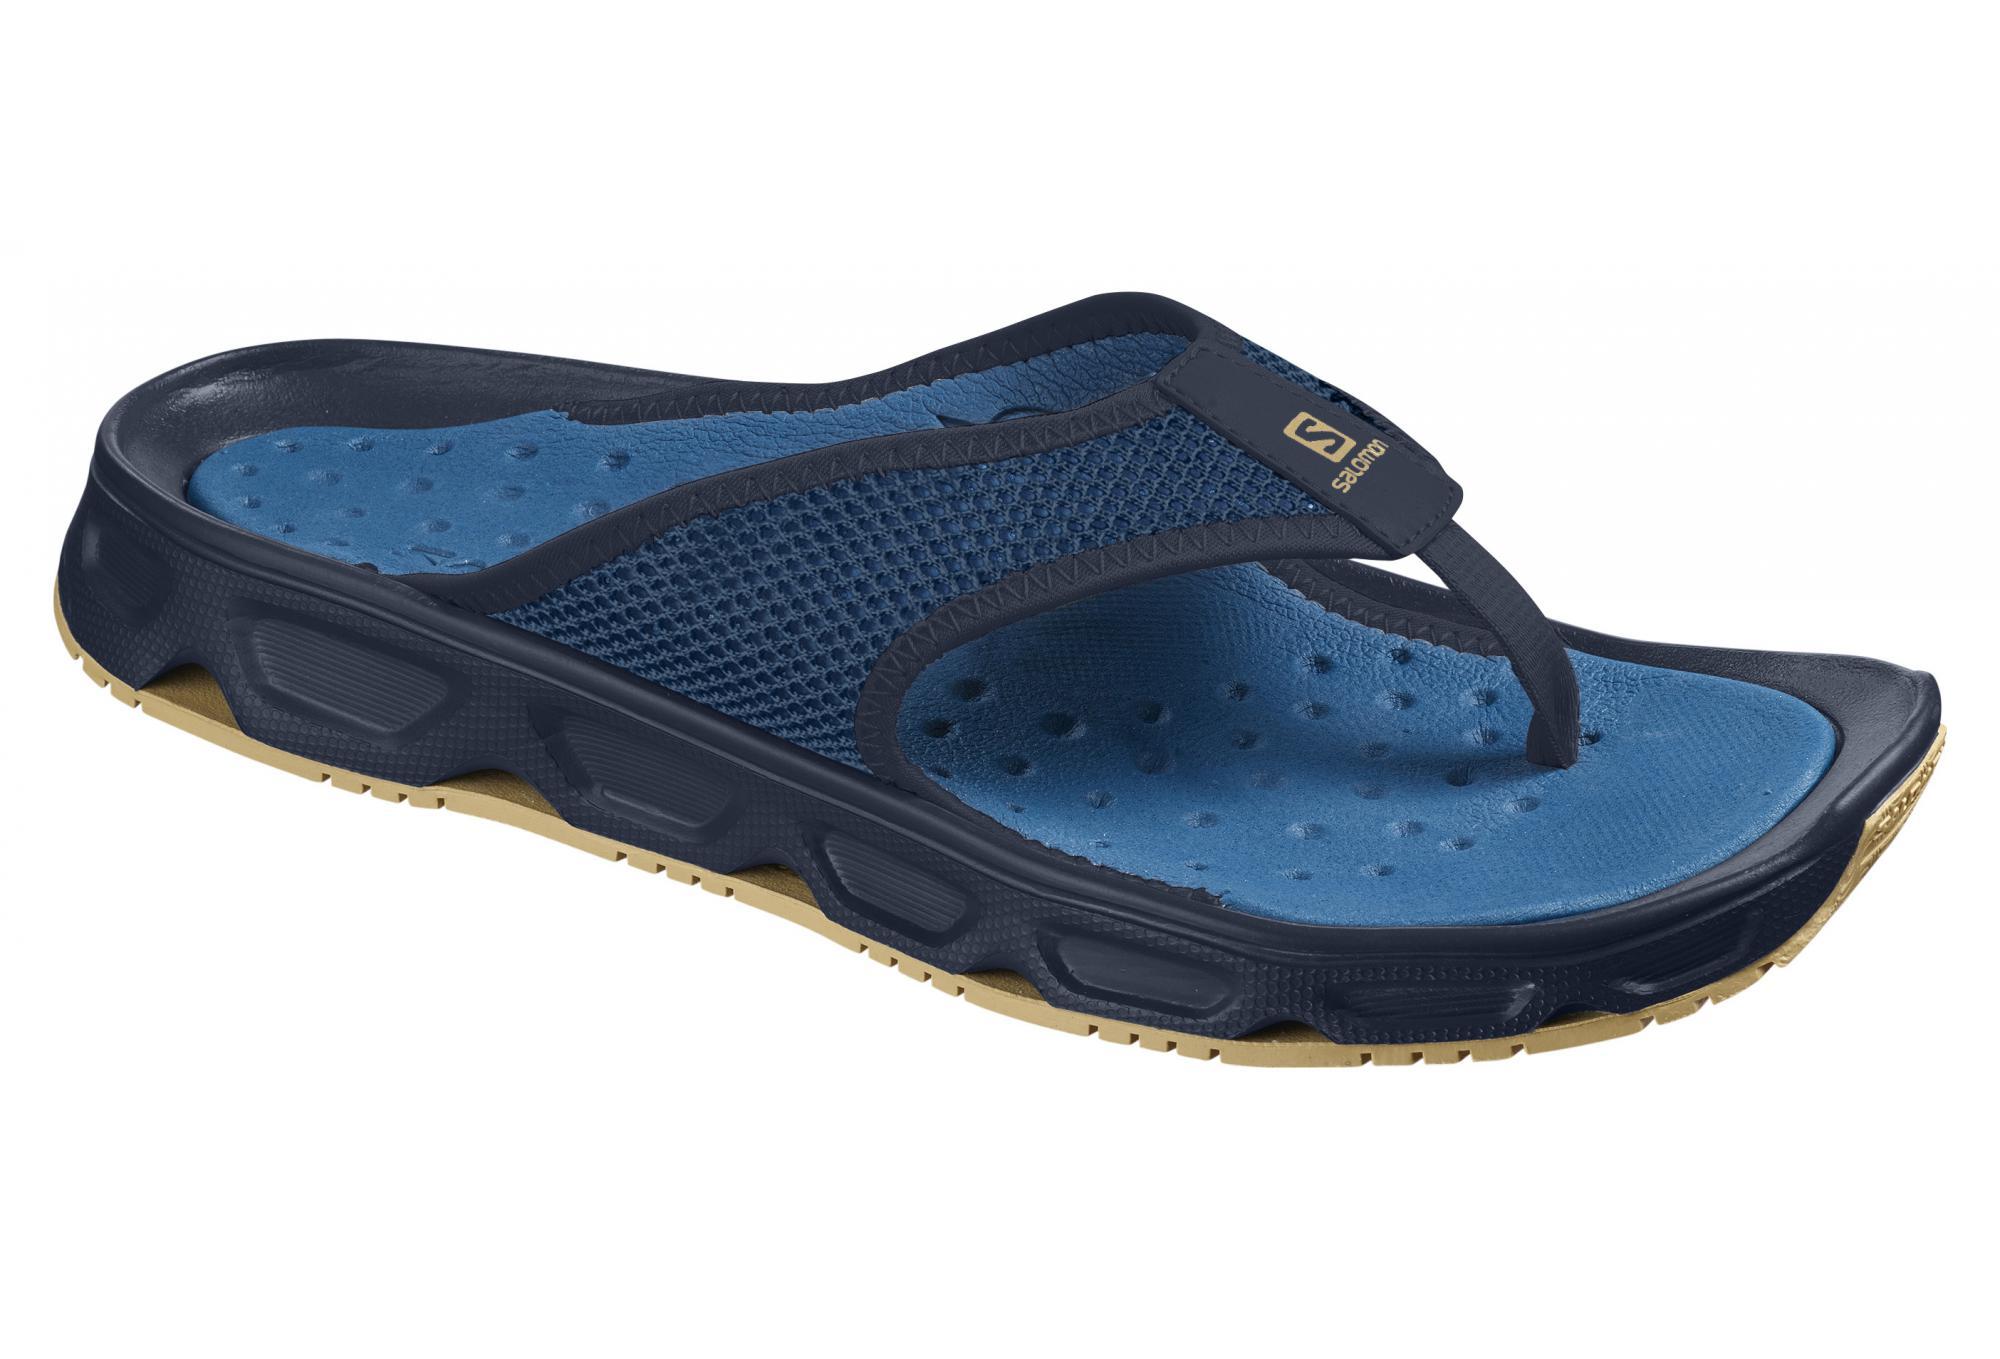 info for 654f9 b9442 Salomon Rx Break 4.0 Recovery Shoes Blue   Alltricks.com